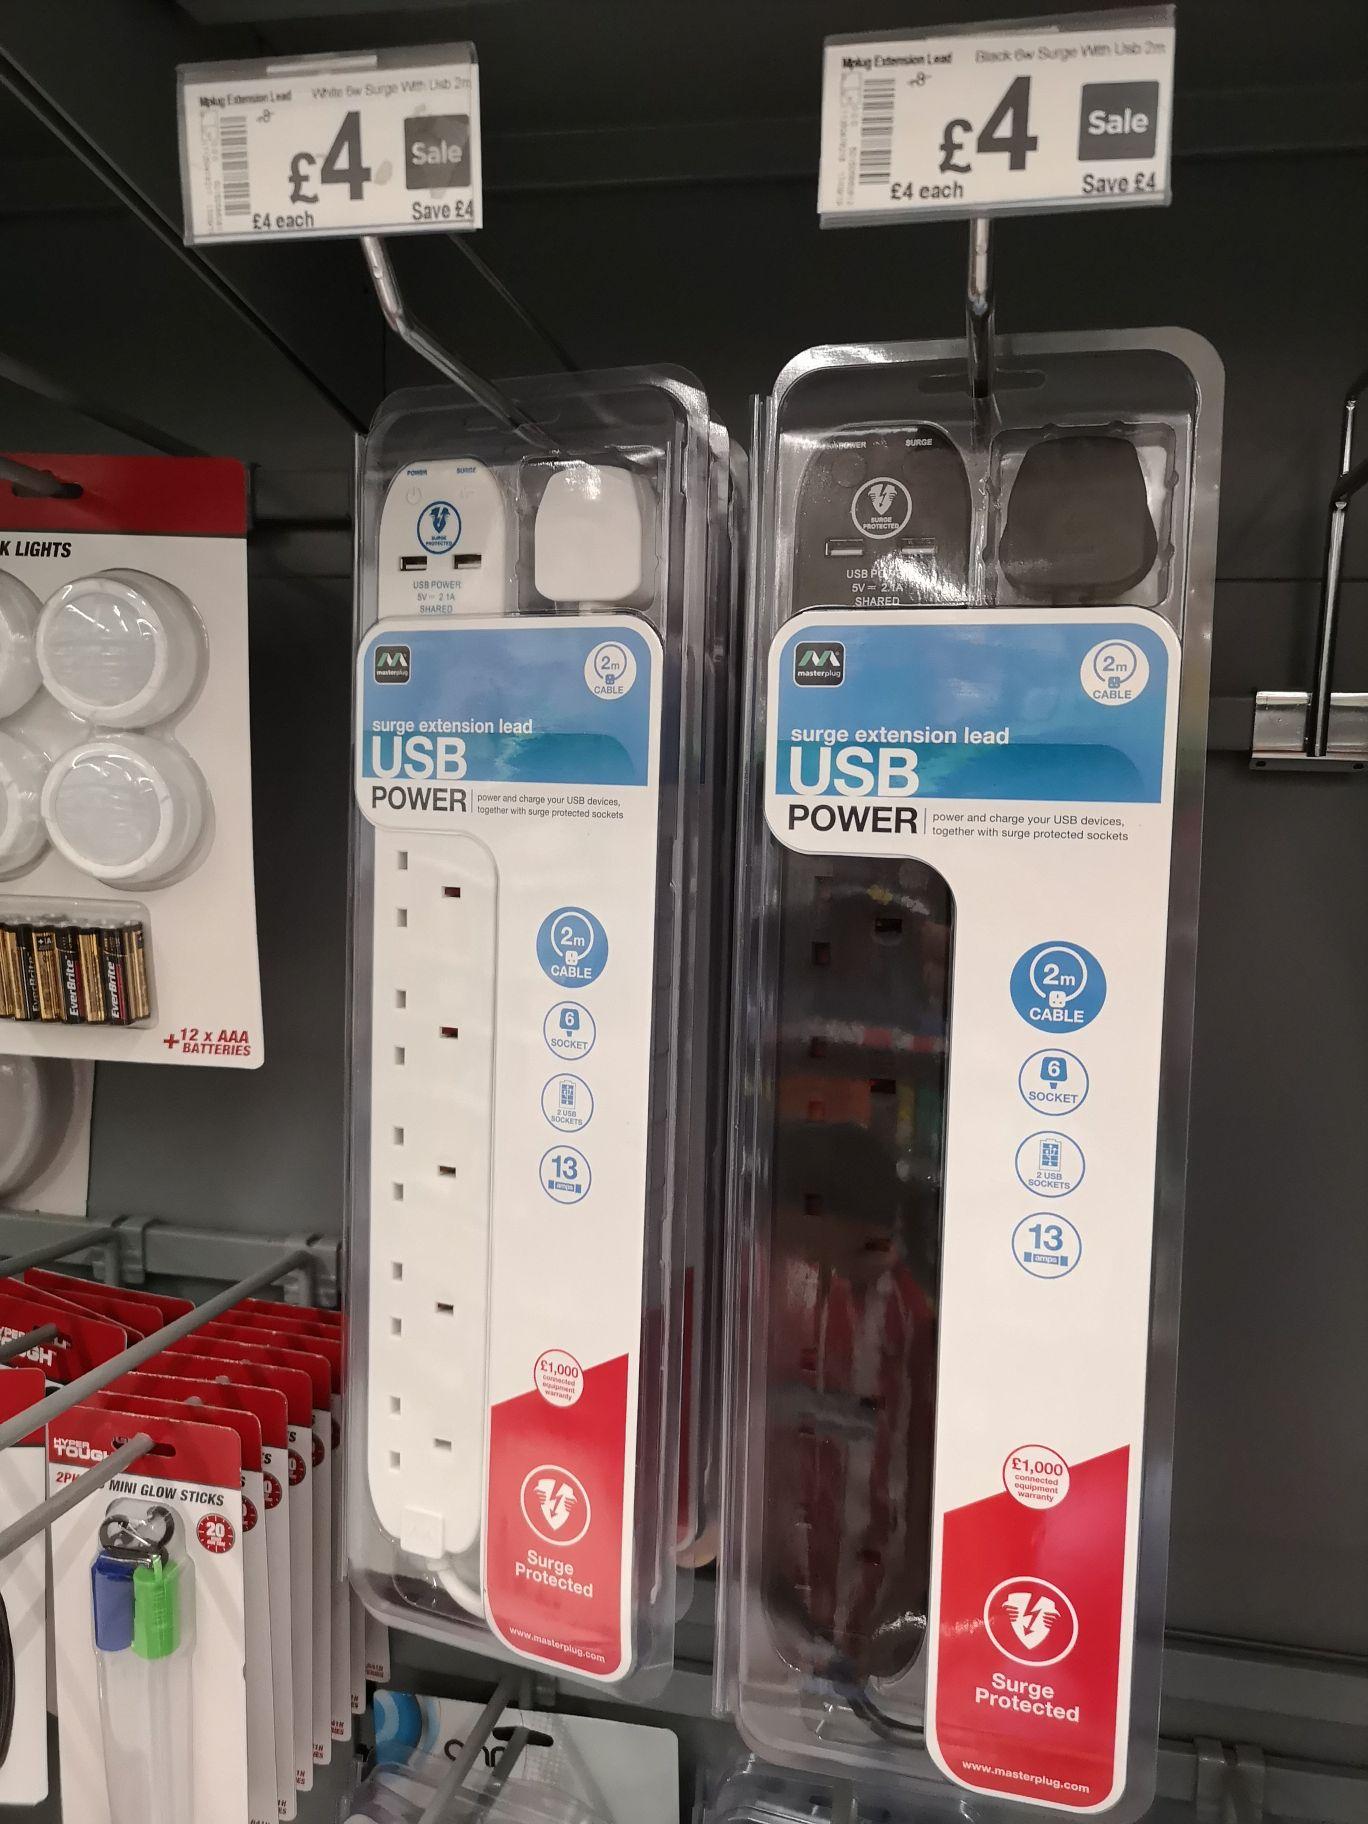 6 Socket Surge Extension Lead including X2 2.1 USB £4 @ Asda instore